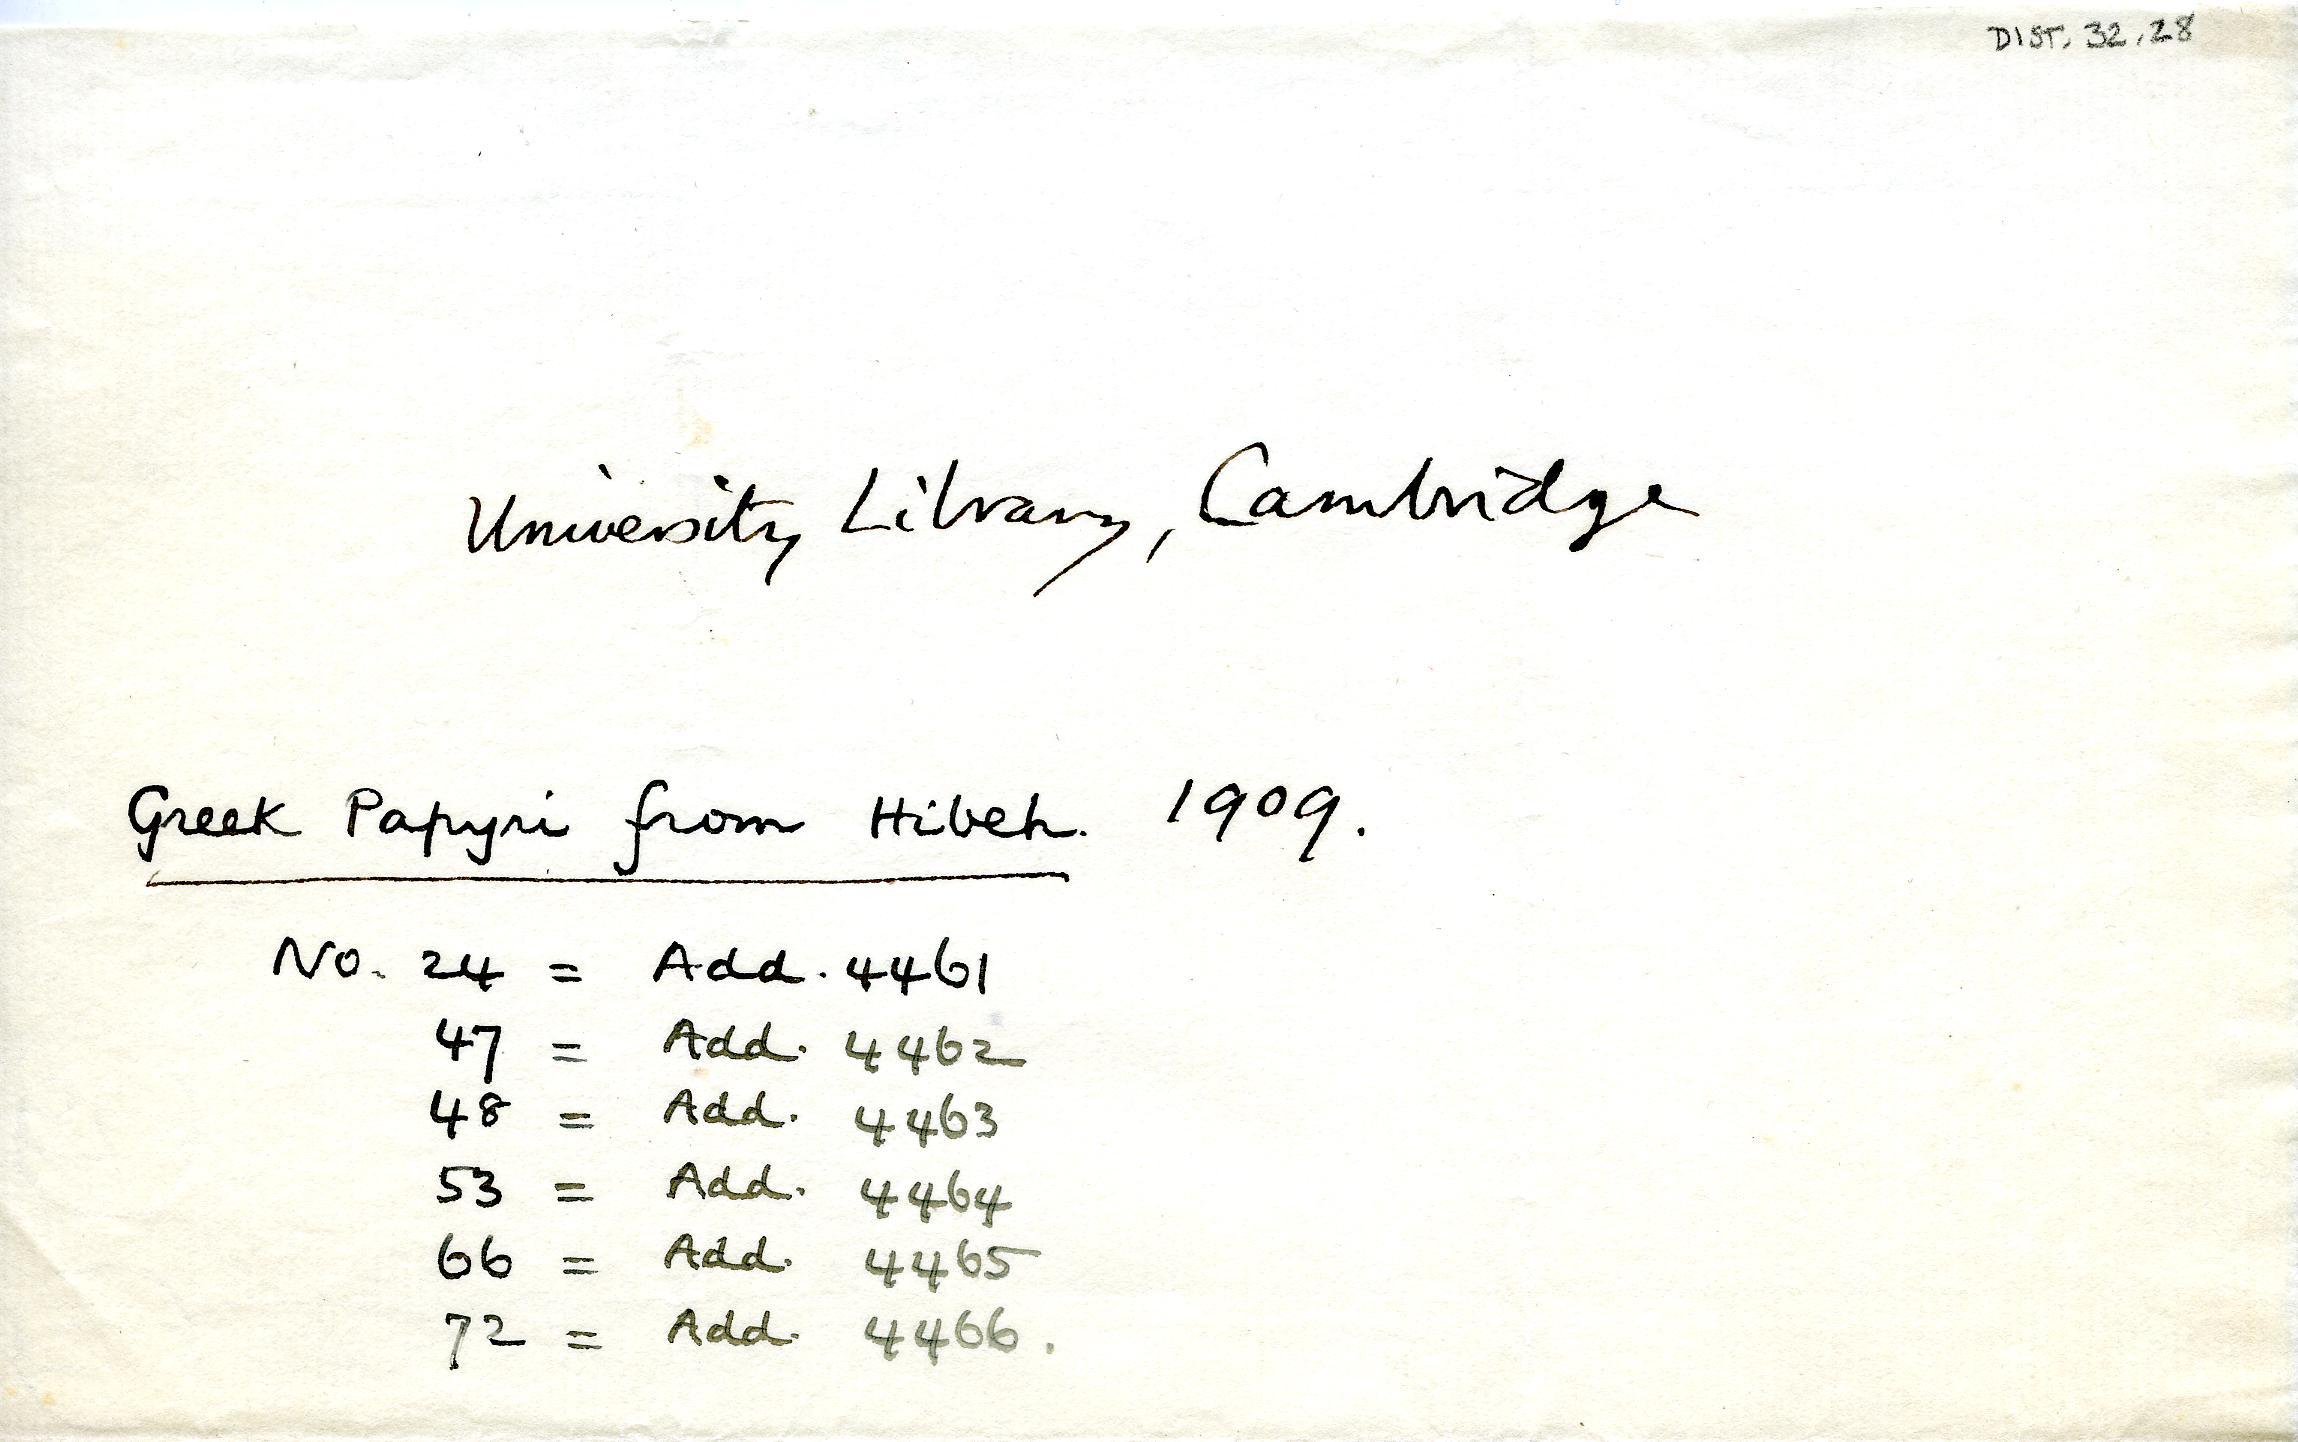 1908-13 Papyri DIST.32.28